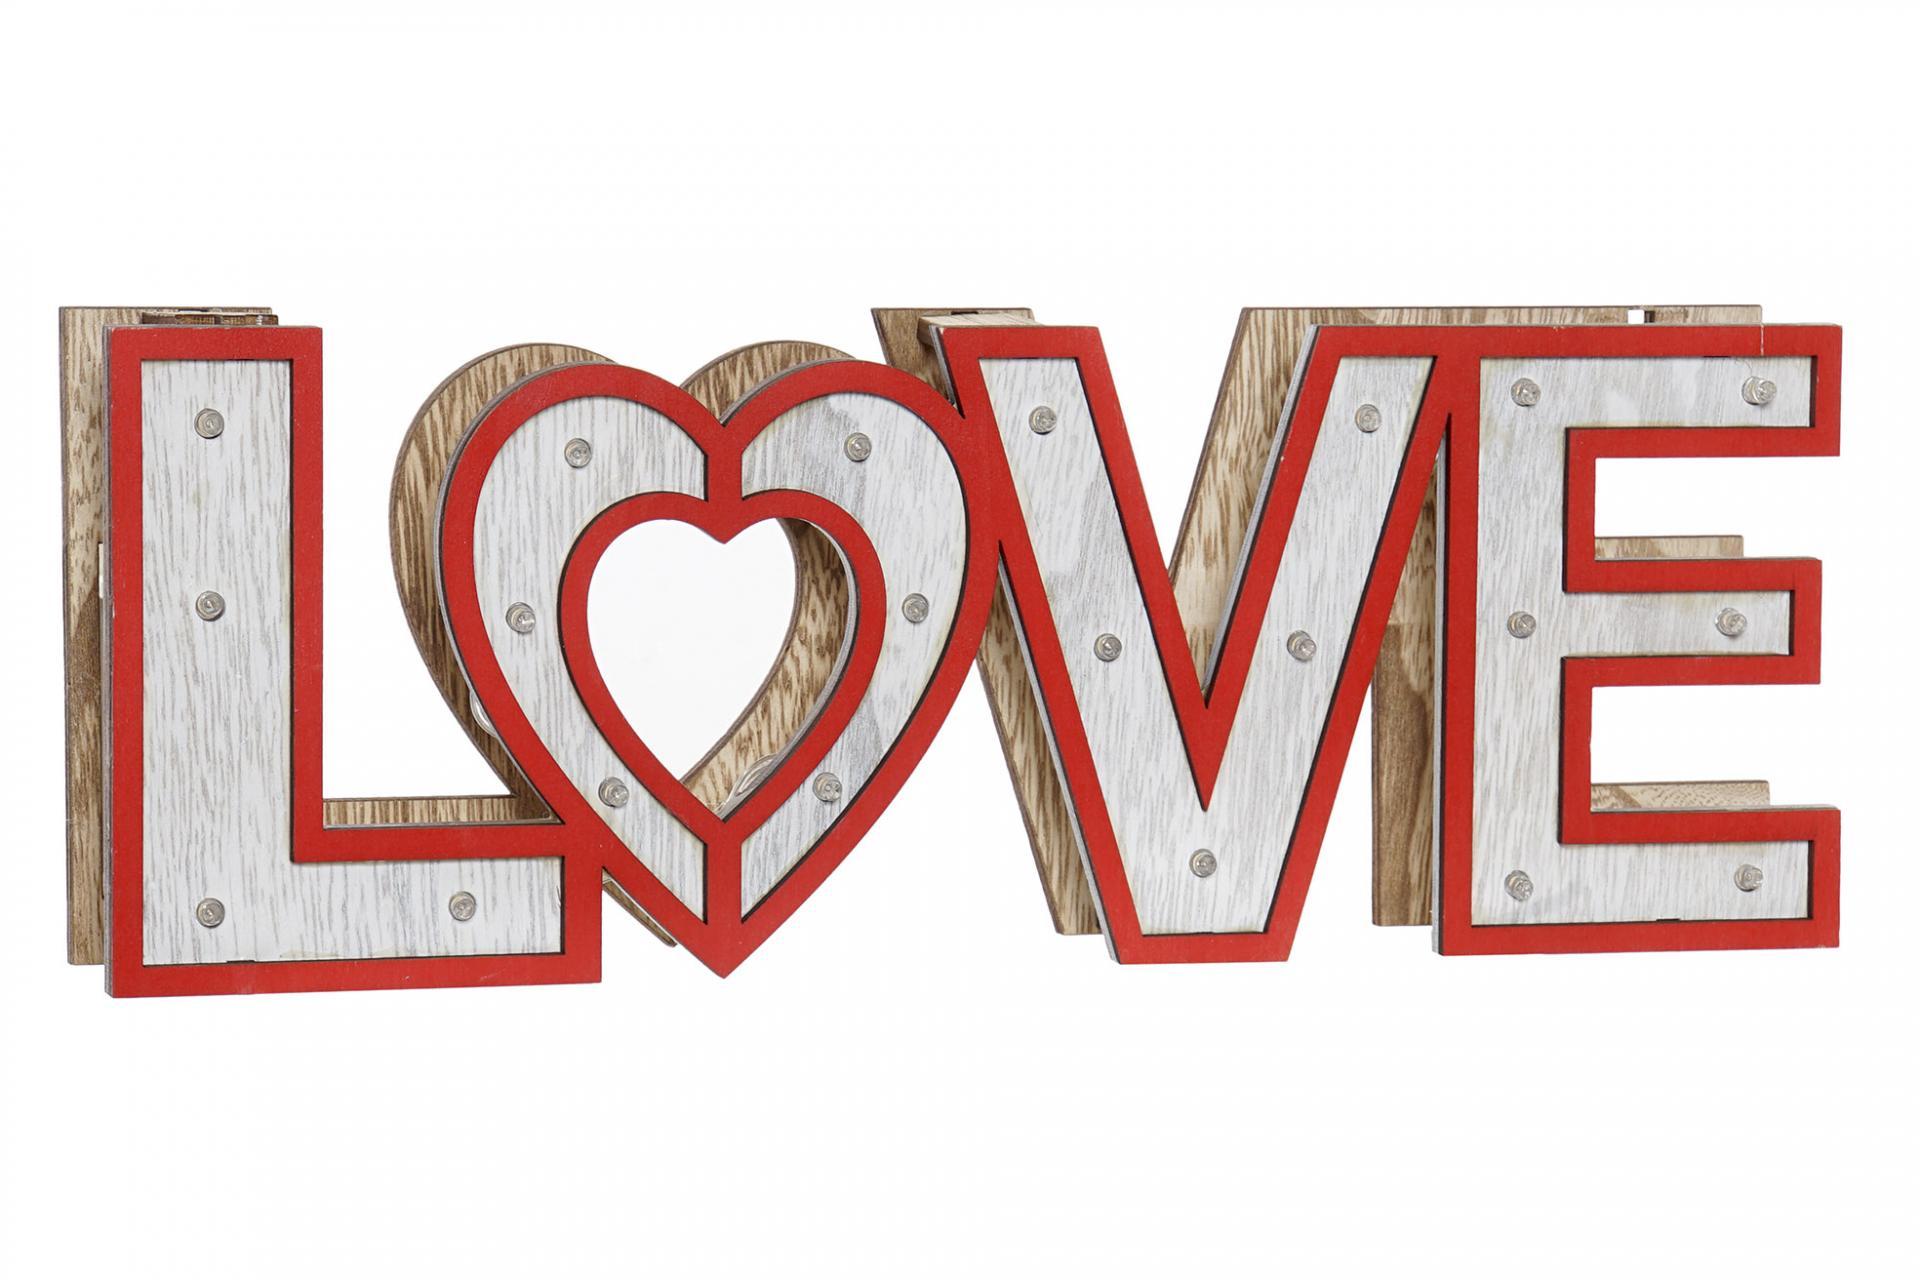 DECORACION LUMINOSA EN MADERA LOVE ROJO 35X4X12 (ITEM INTERNATIONAL)